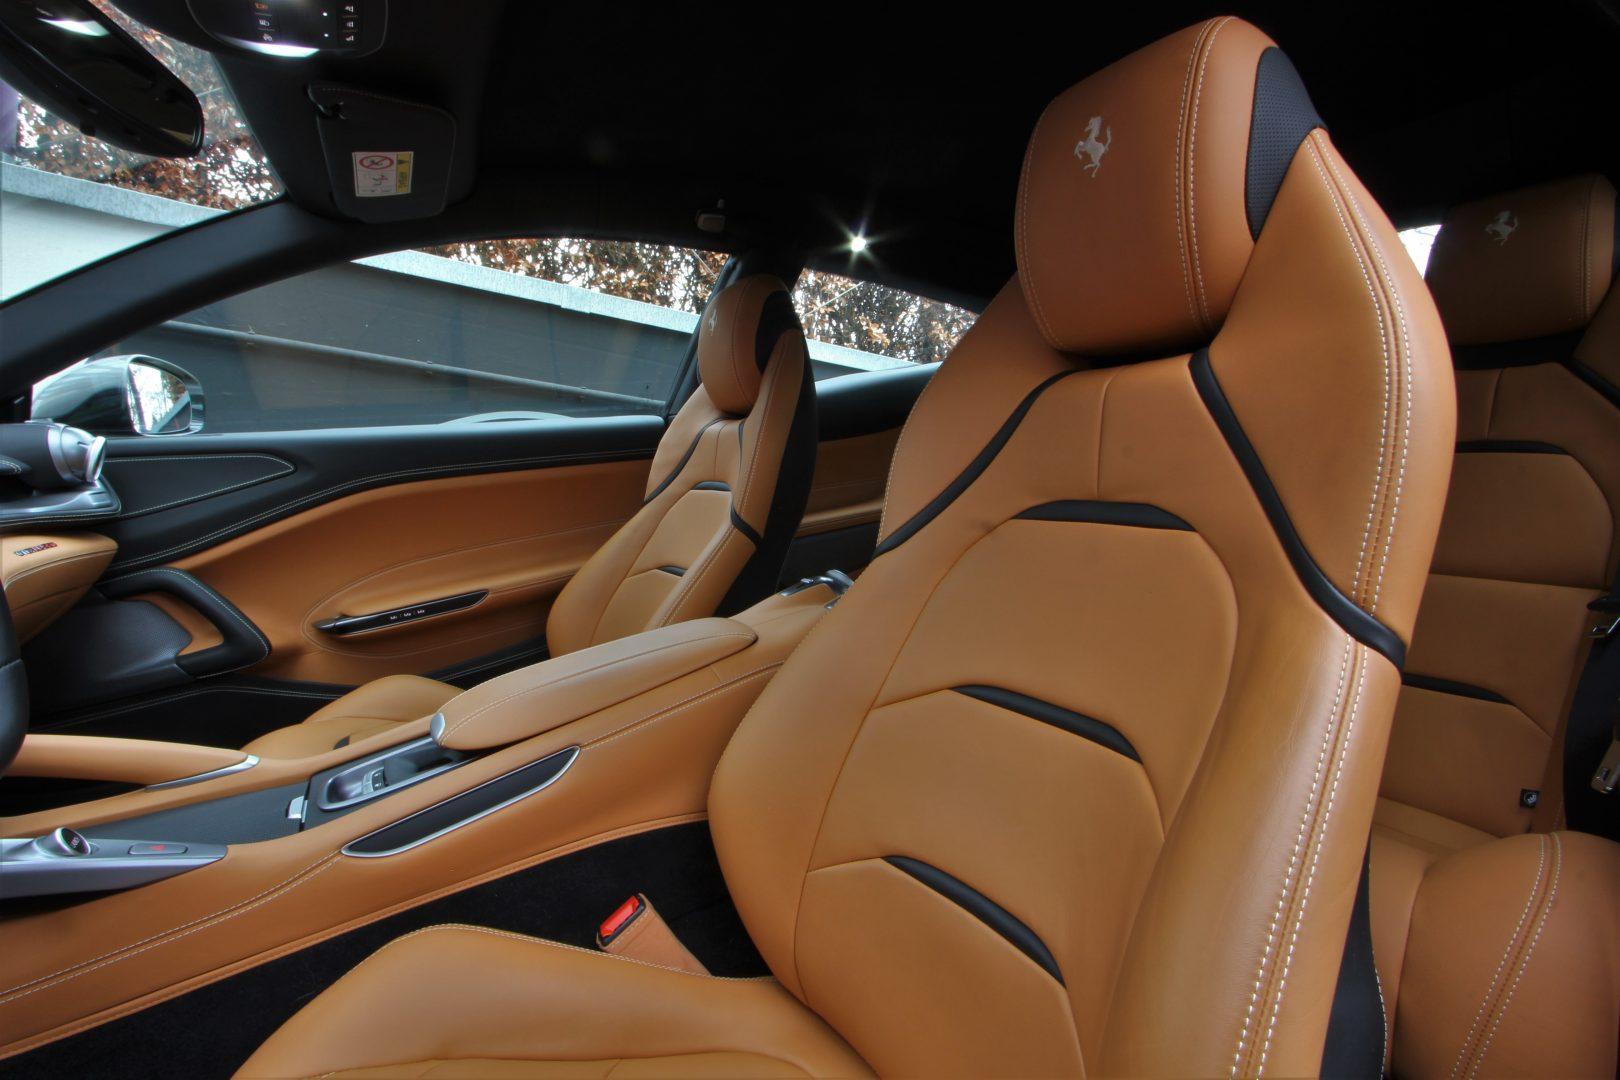 AIL Ferrari GTC4Lusso 5